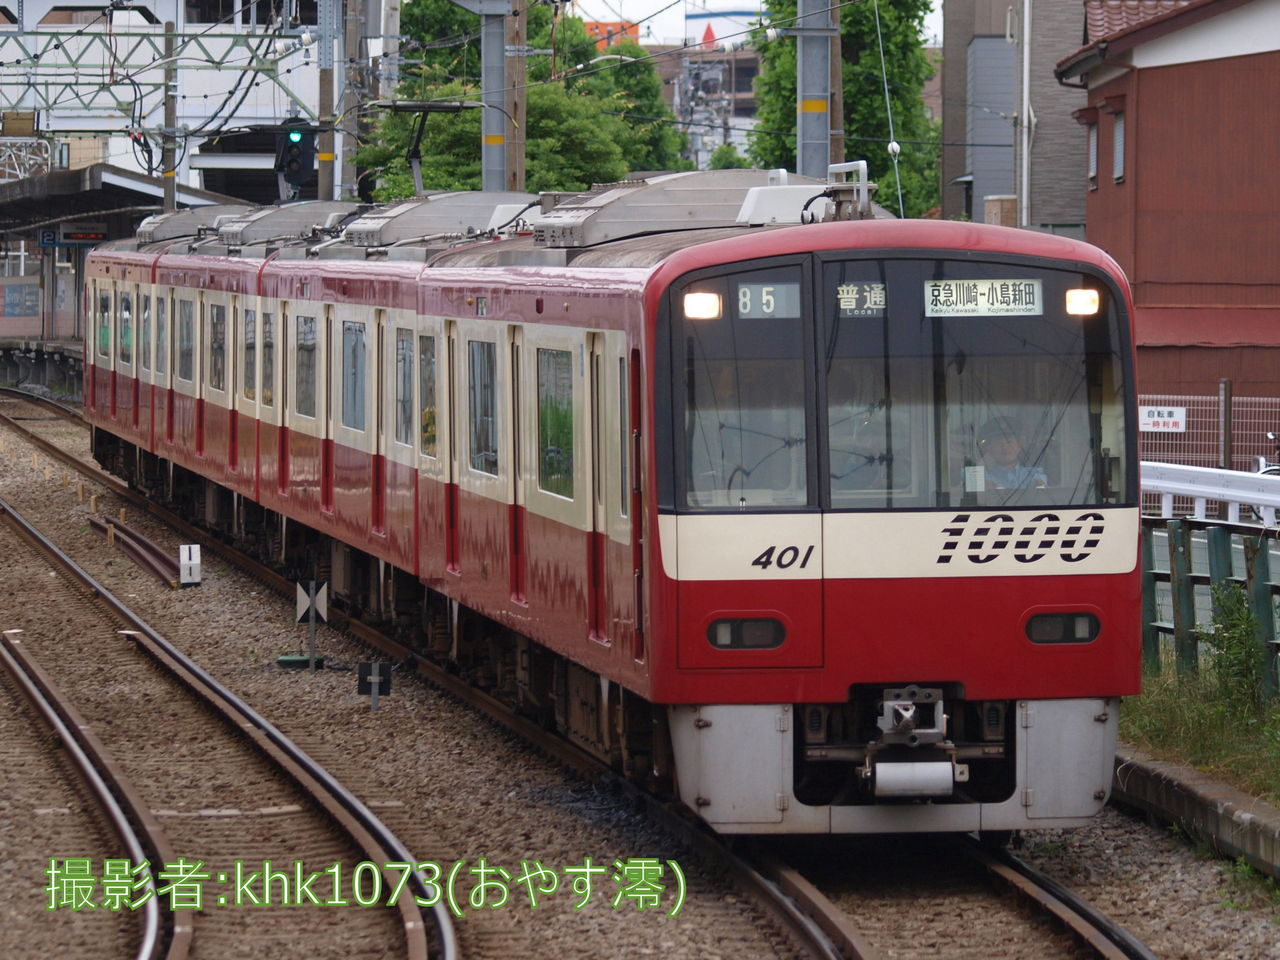 京急ニュース : 大師線運用